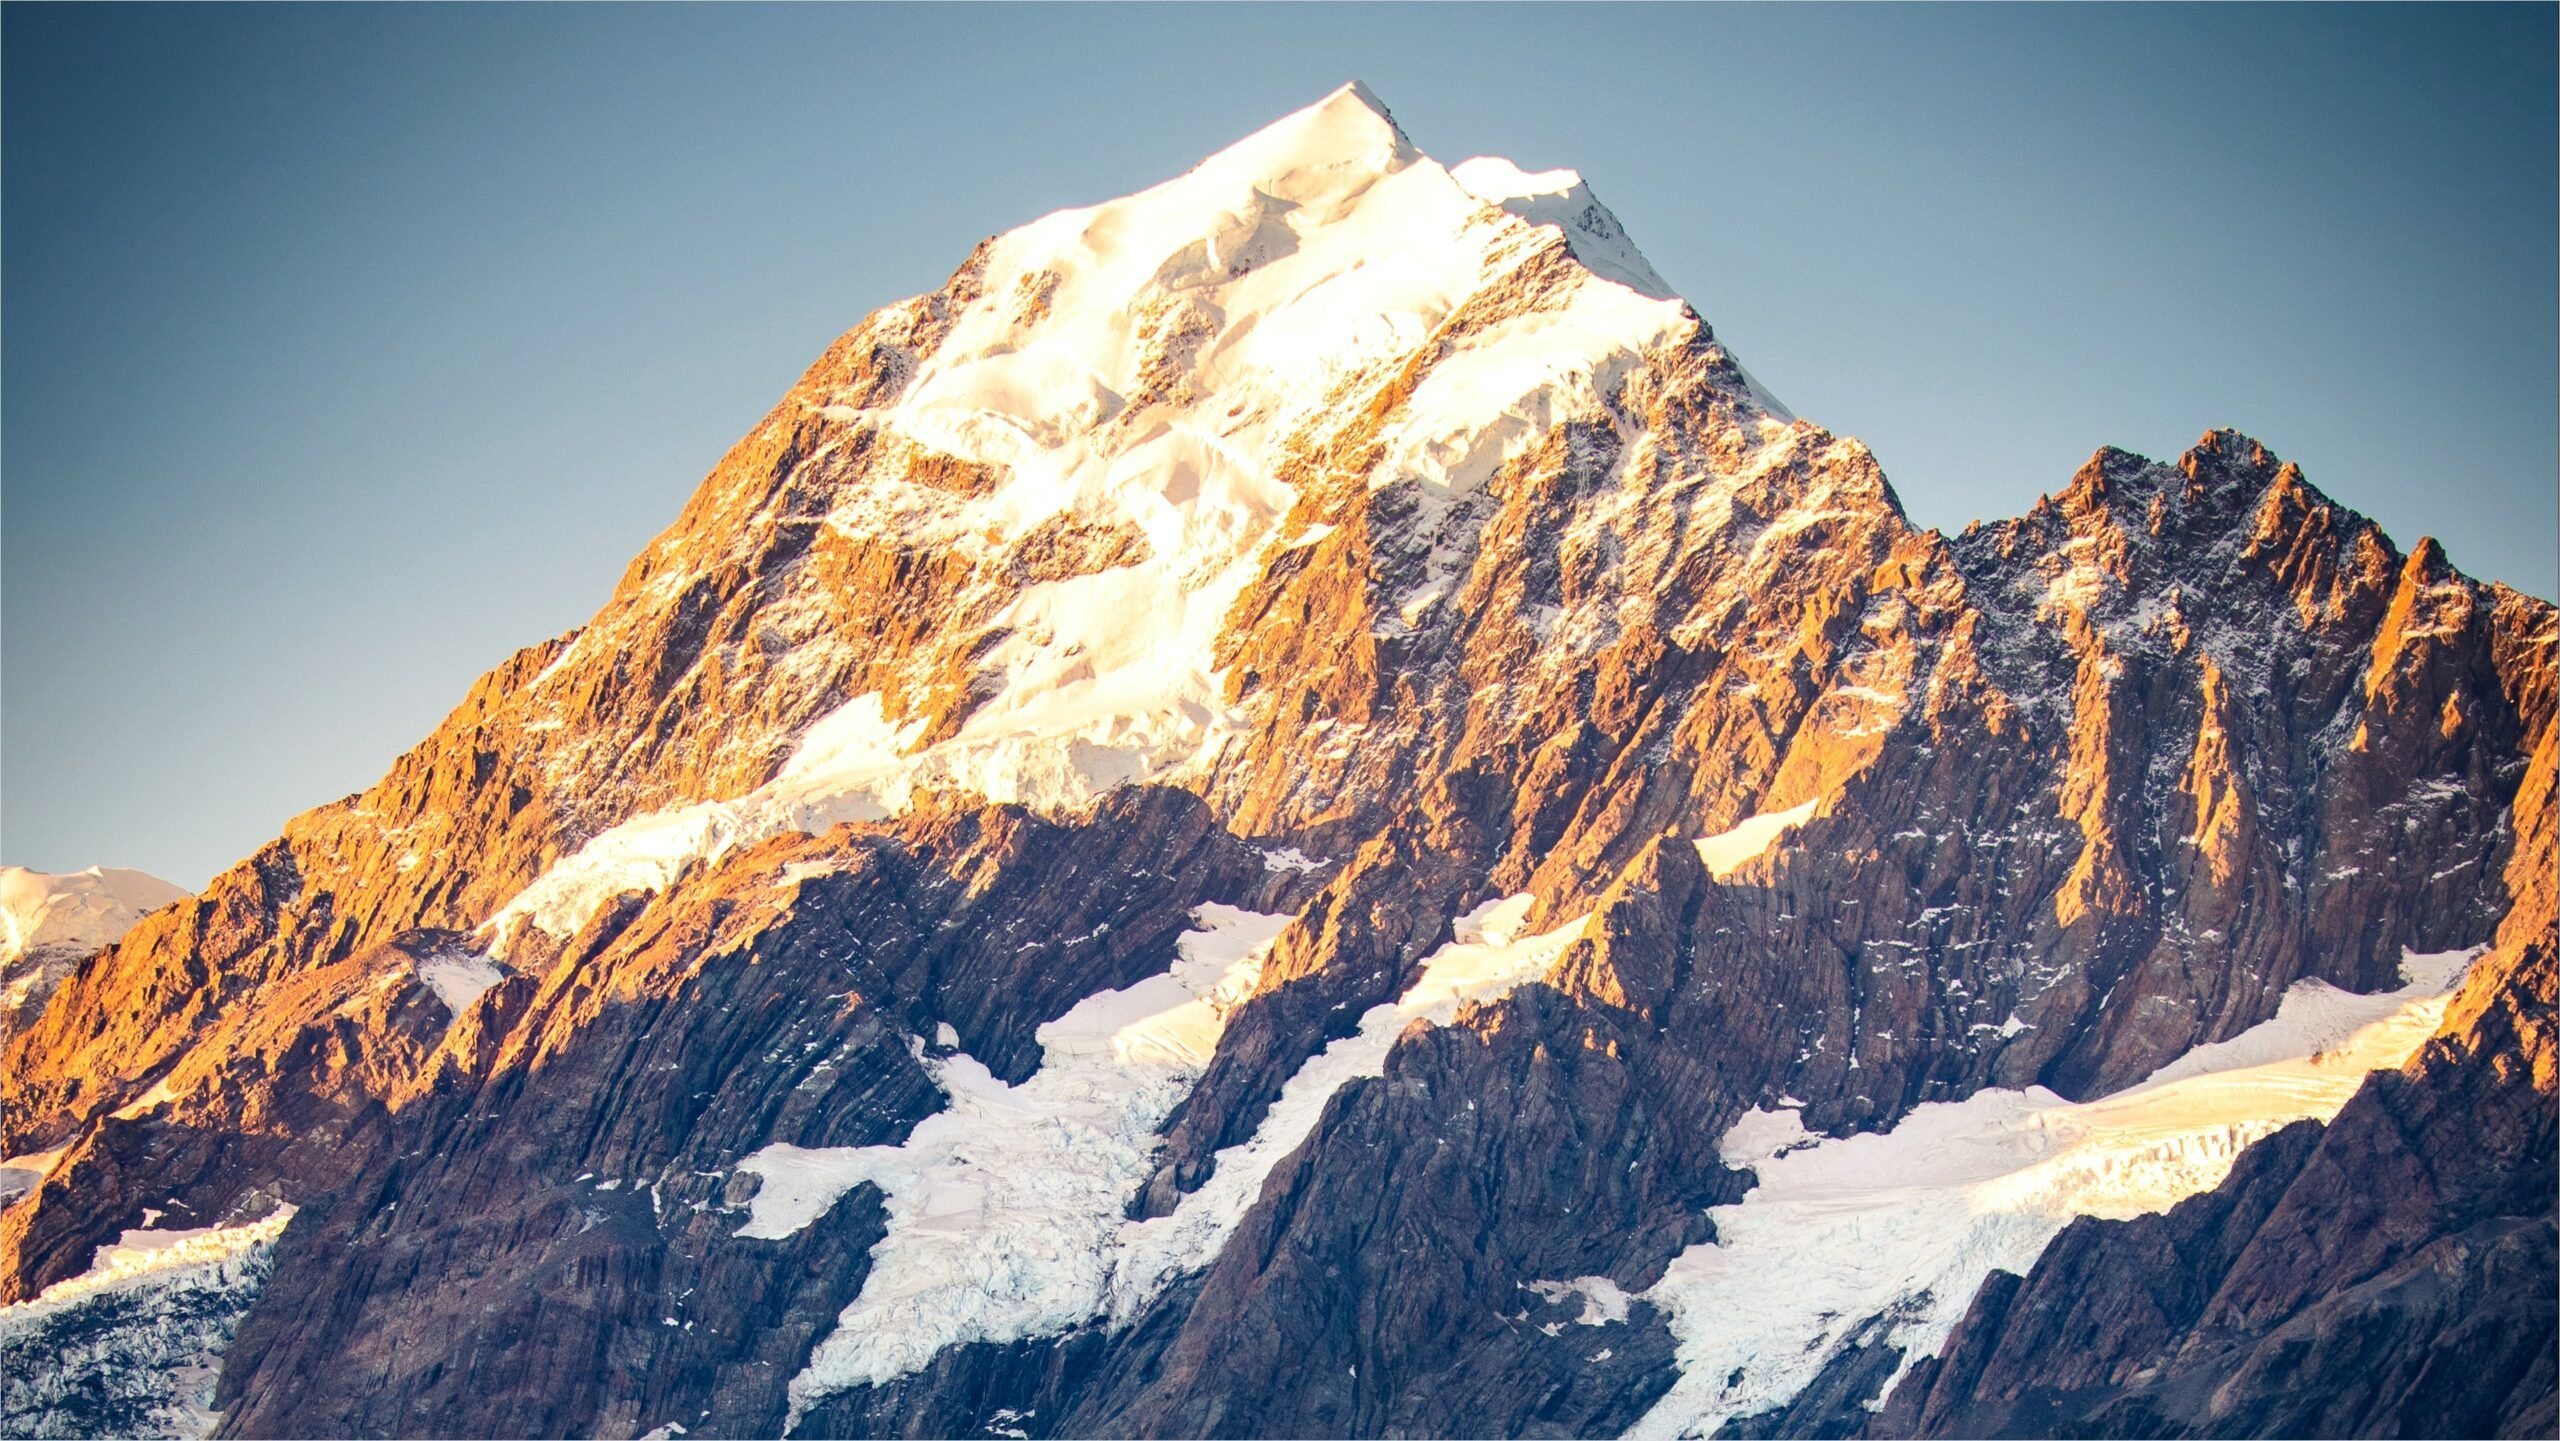 4k Snow Mountain Wallpaper In 2020 Mountain Wallpaper Snow Mountain Wallpaper